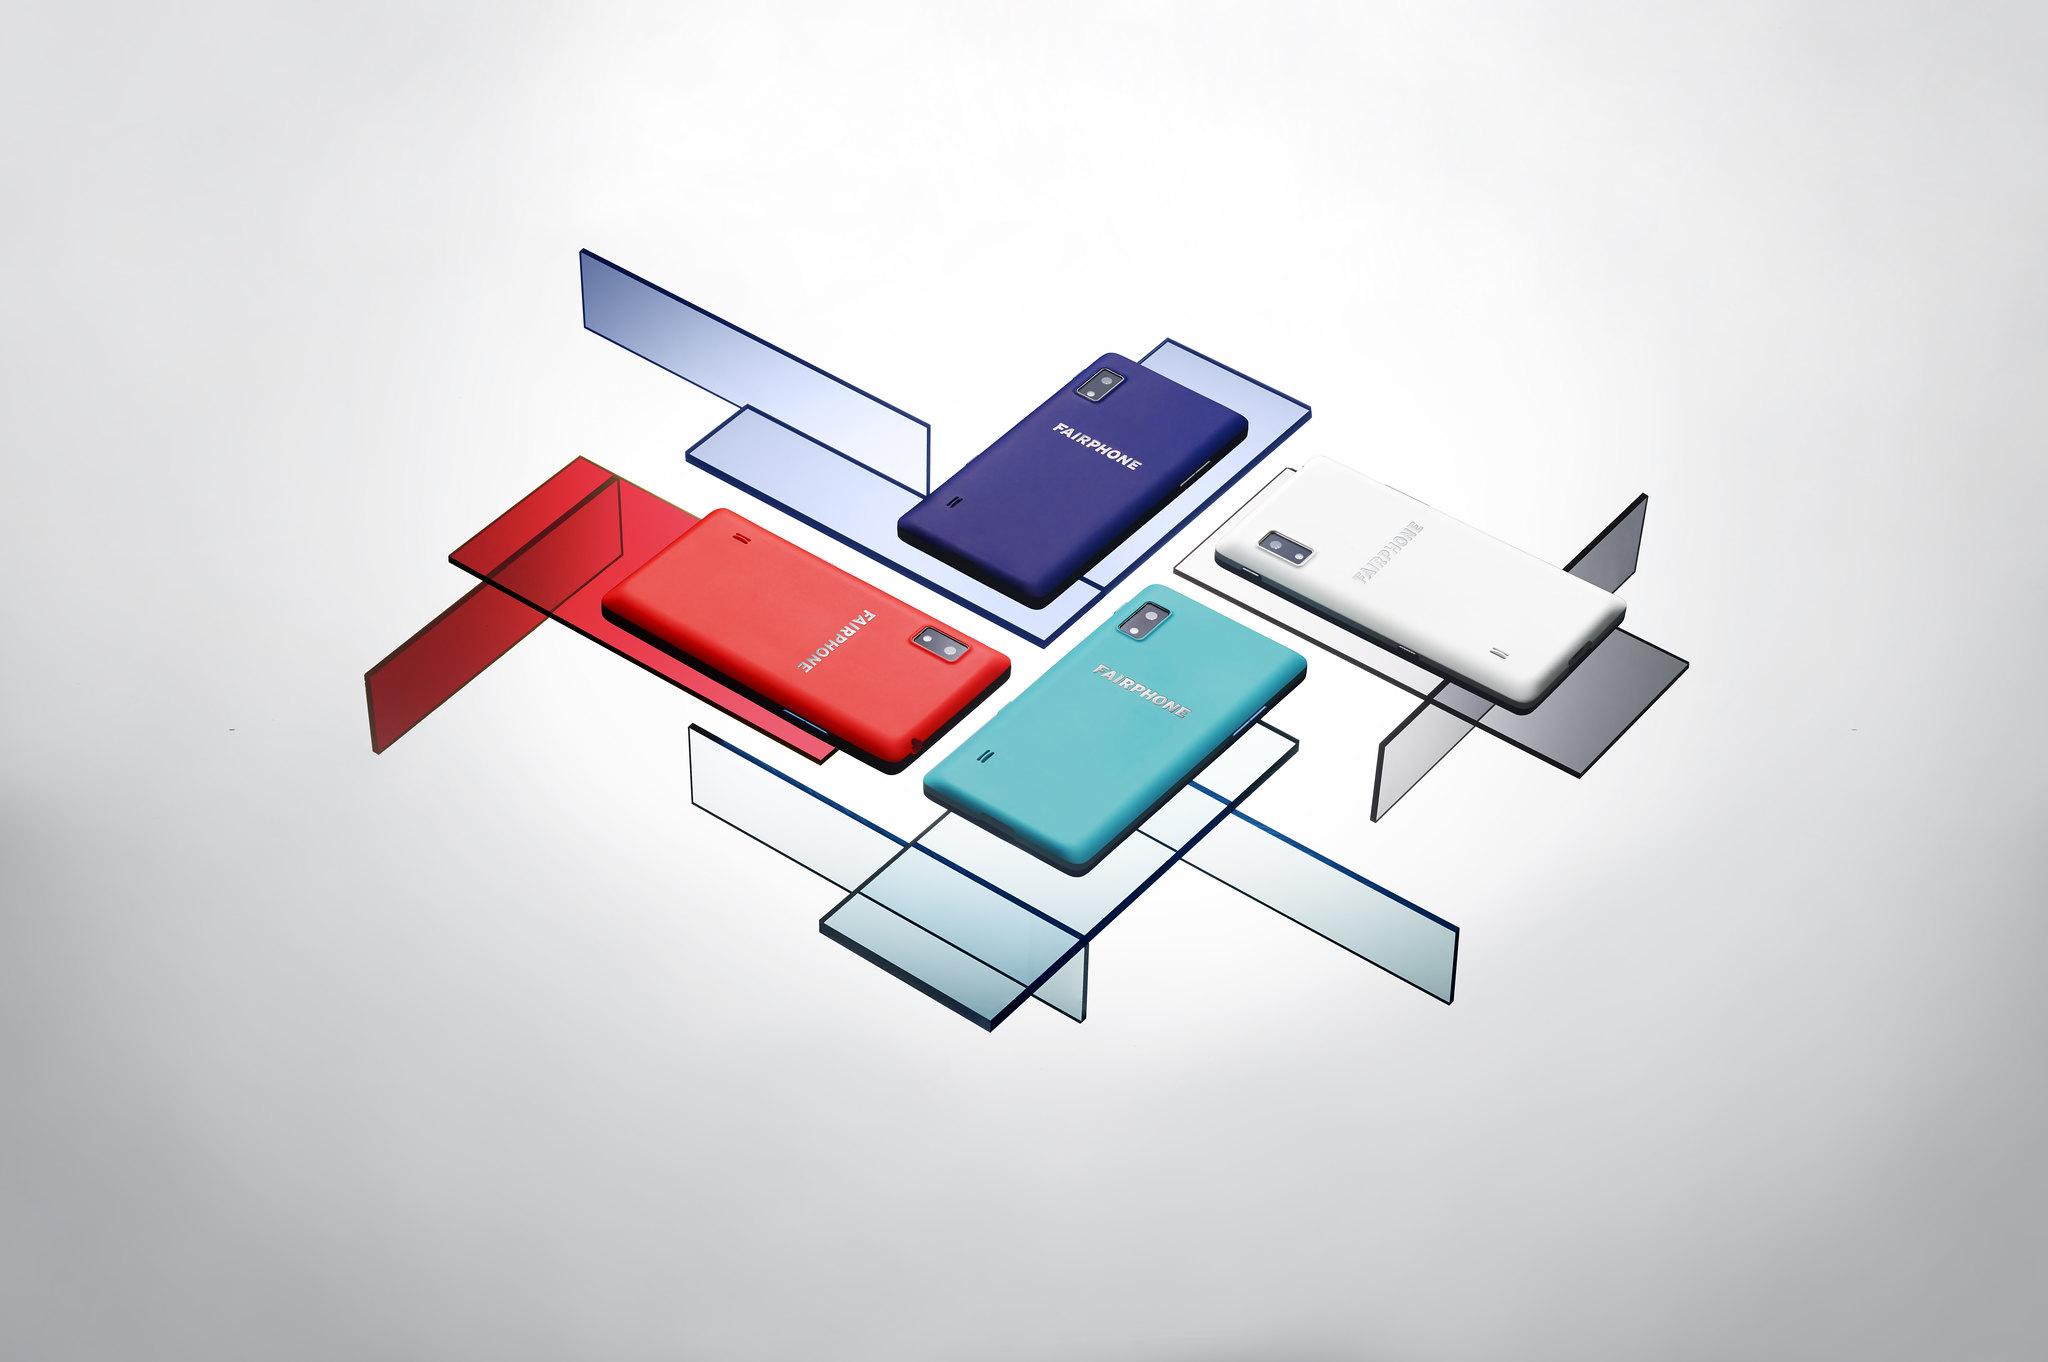 Fairphone 2 : sorti en 2015, le smartphone va passer à Android 9